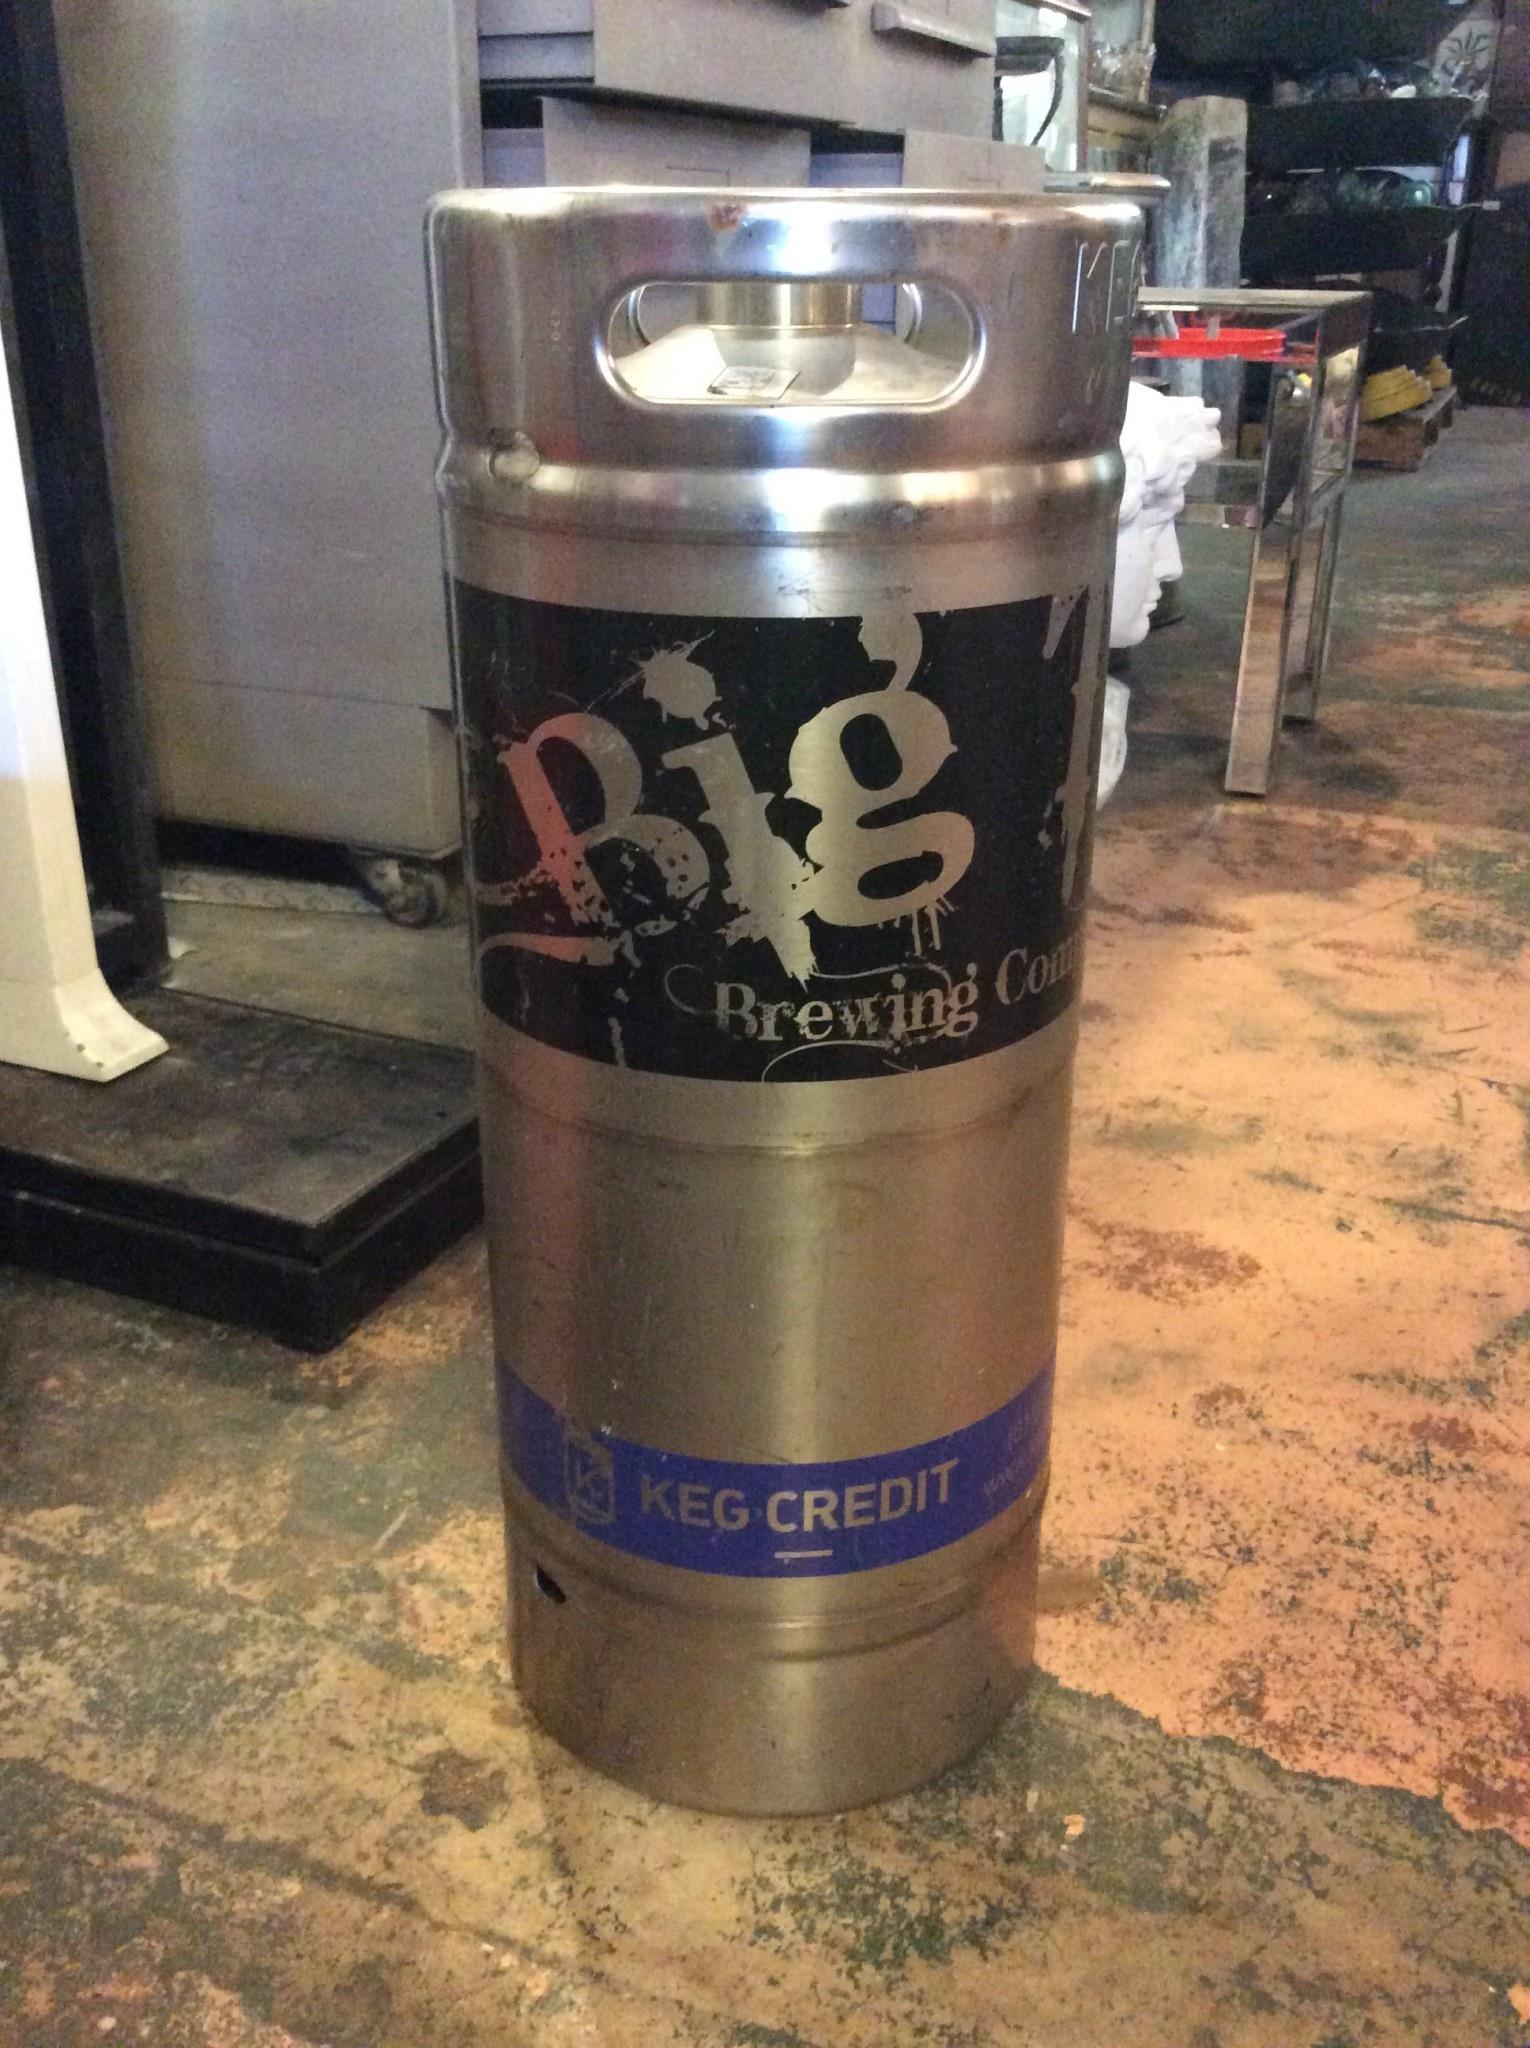 Big top keg